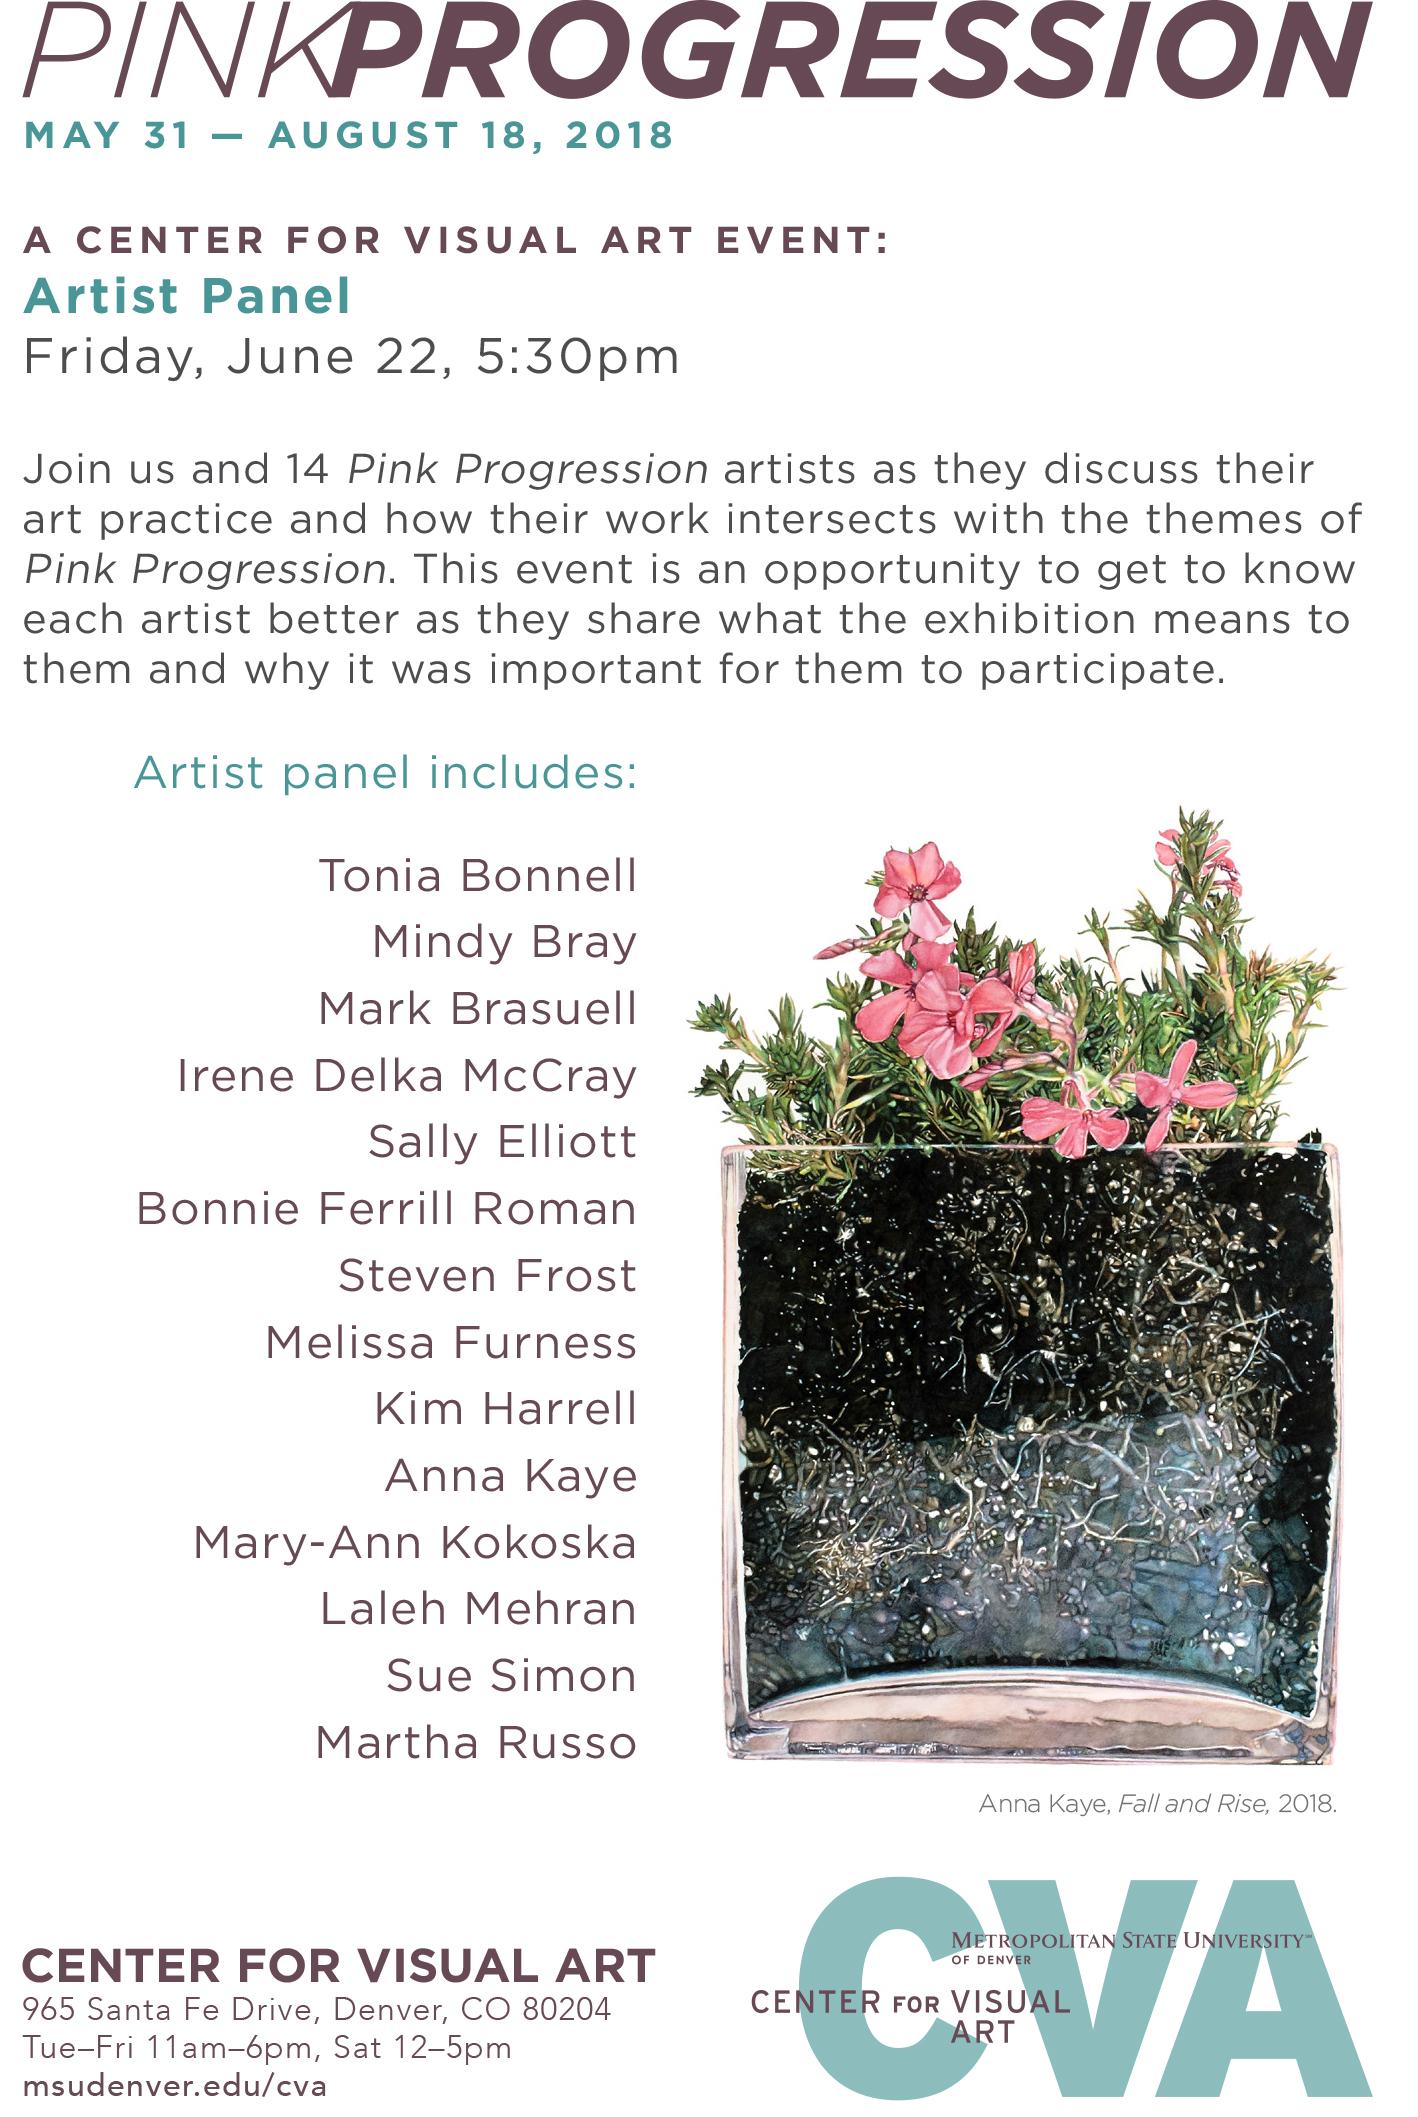 Artist Panel @ CVA - Meet